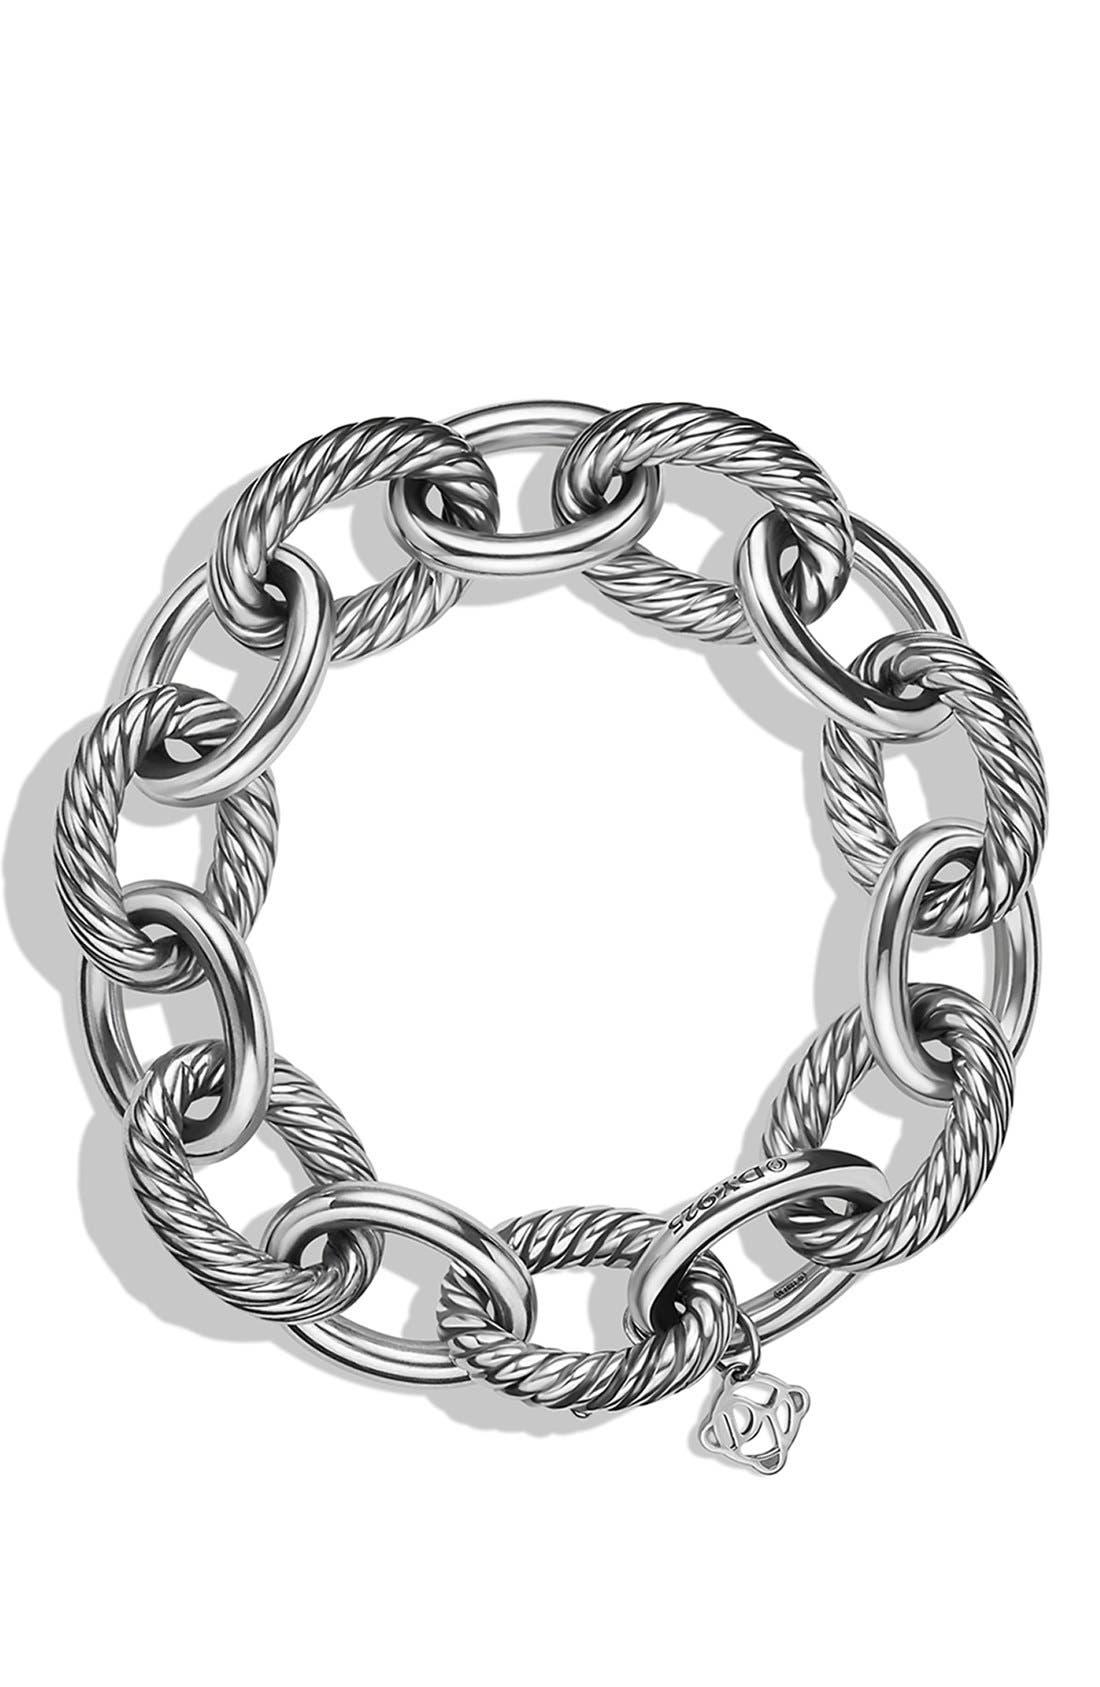 DAVID YURMAN, 'Oval' Extra Large Link Bracelet, Alternate thumbnail 2, color, SILVER